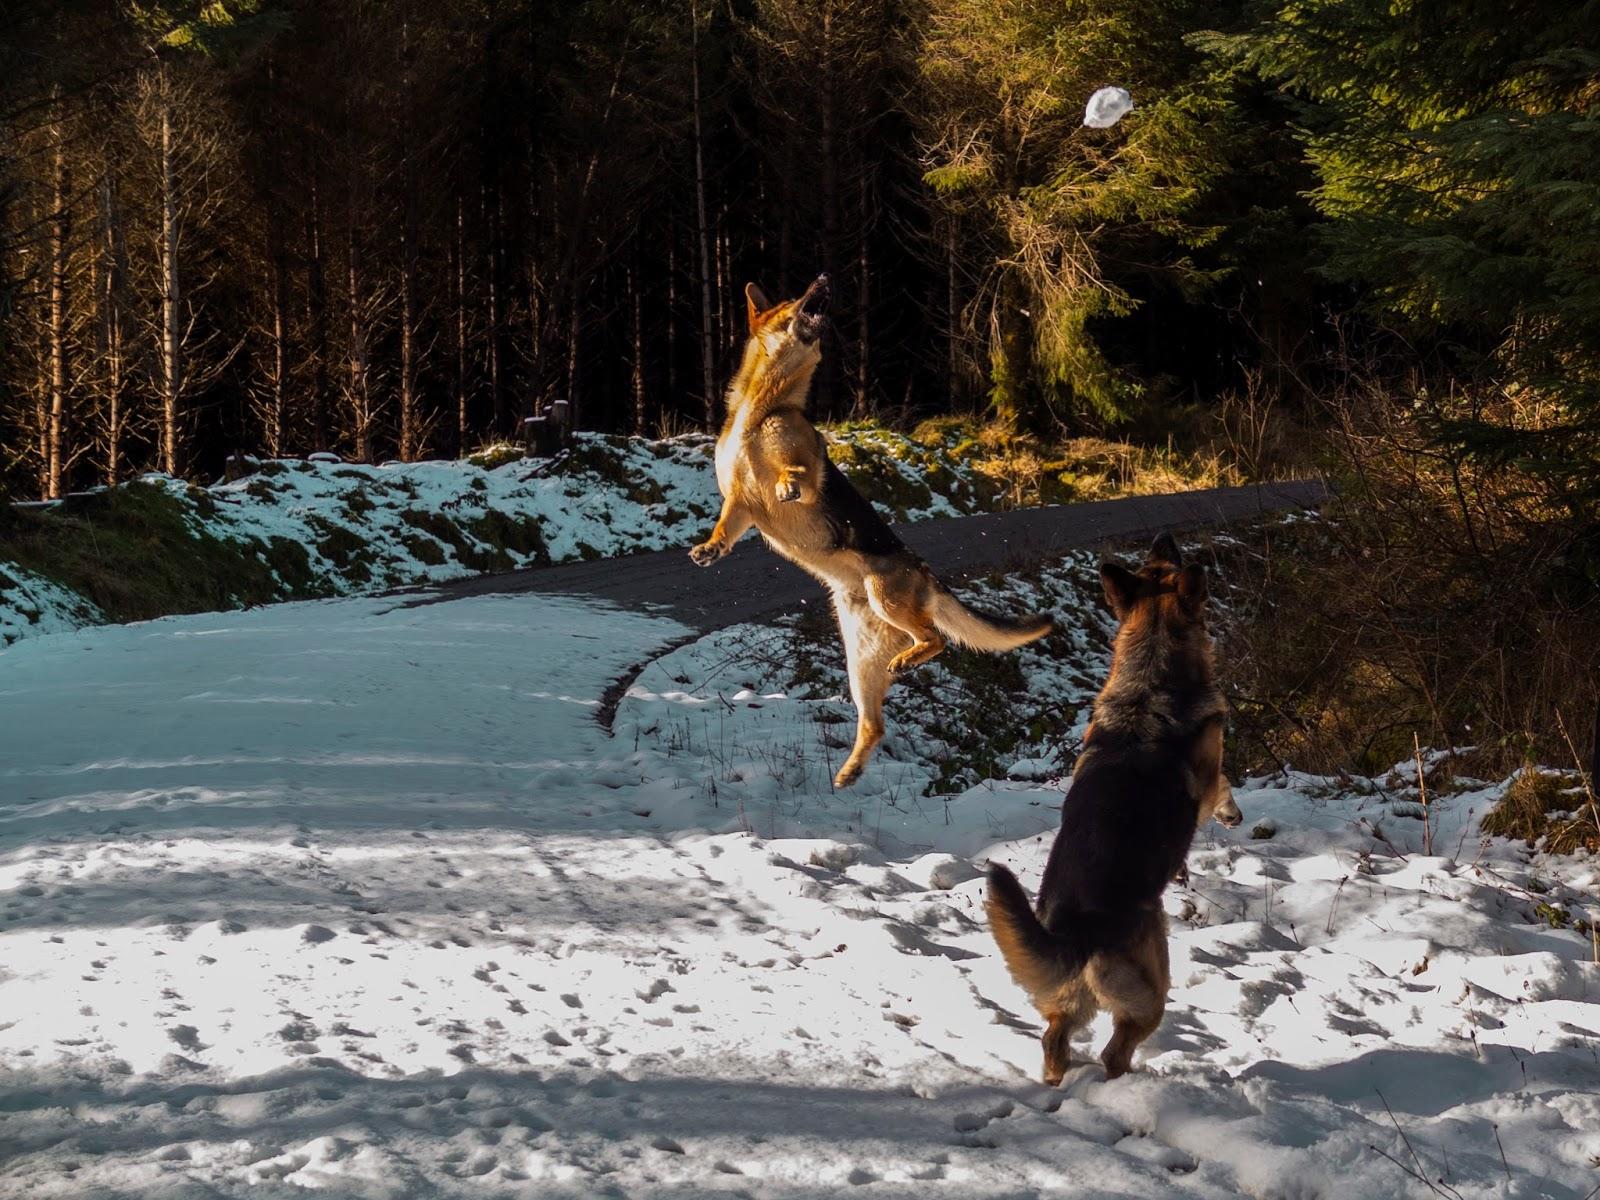 German Shepherd dog jumping to catch a snowball.